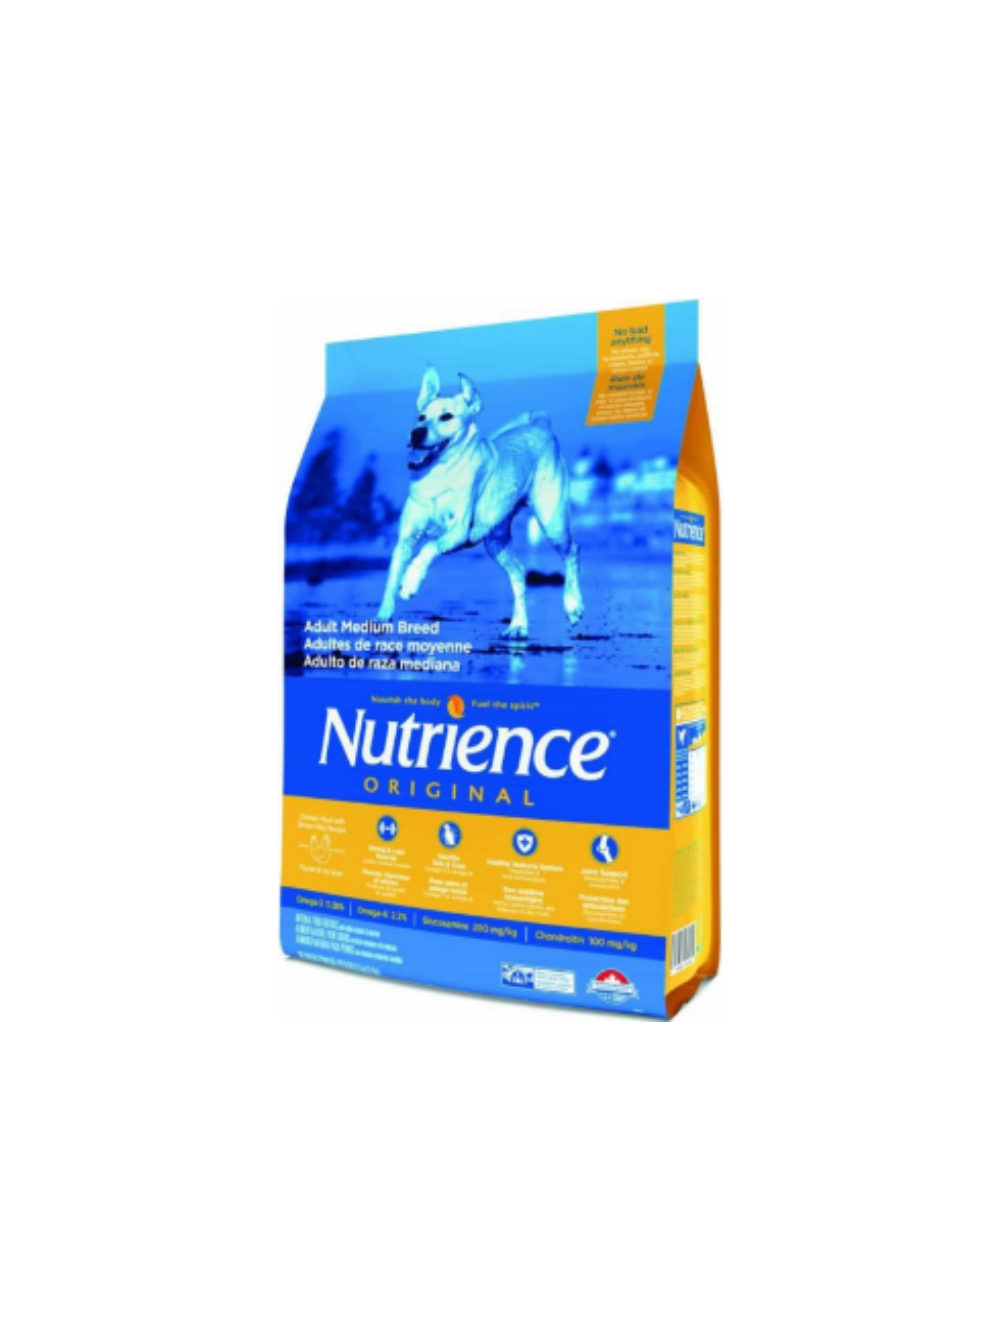 NUTRIENCE ORIGINAL ADULT MEDIUM BREED x 5KG